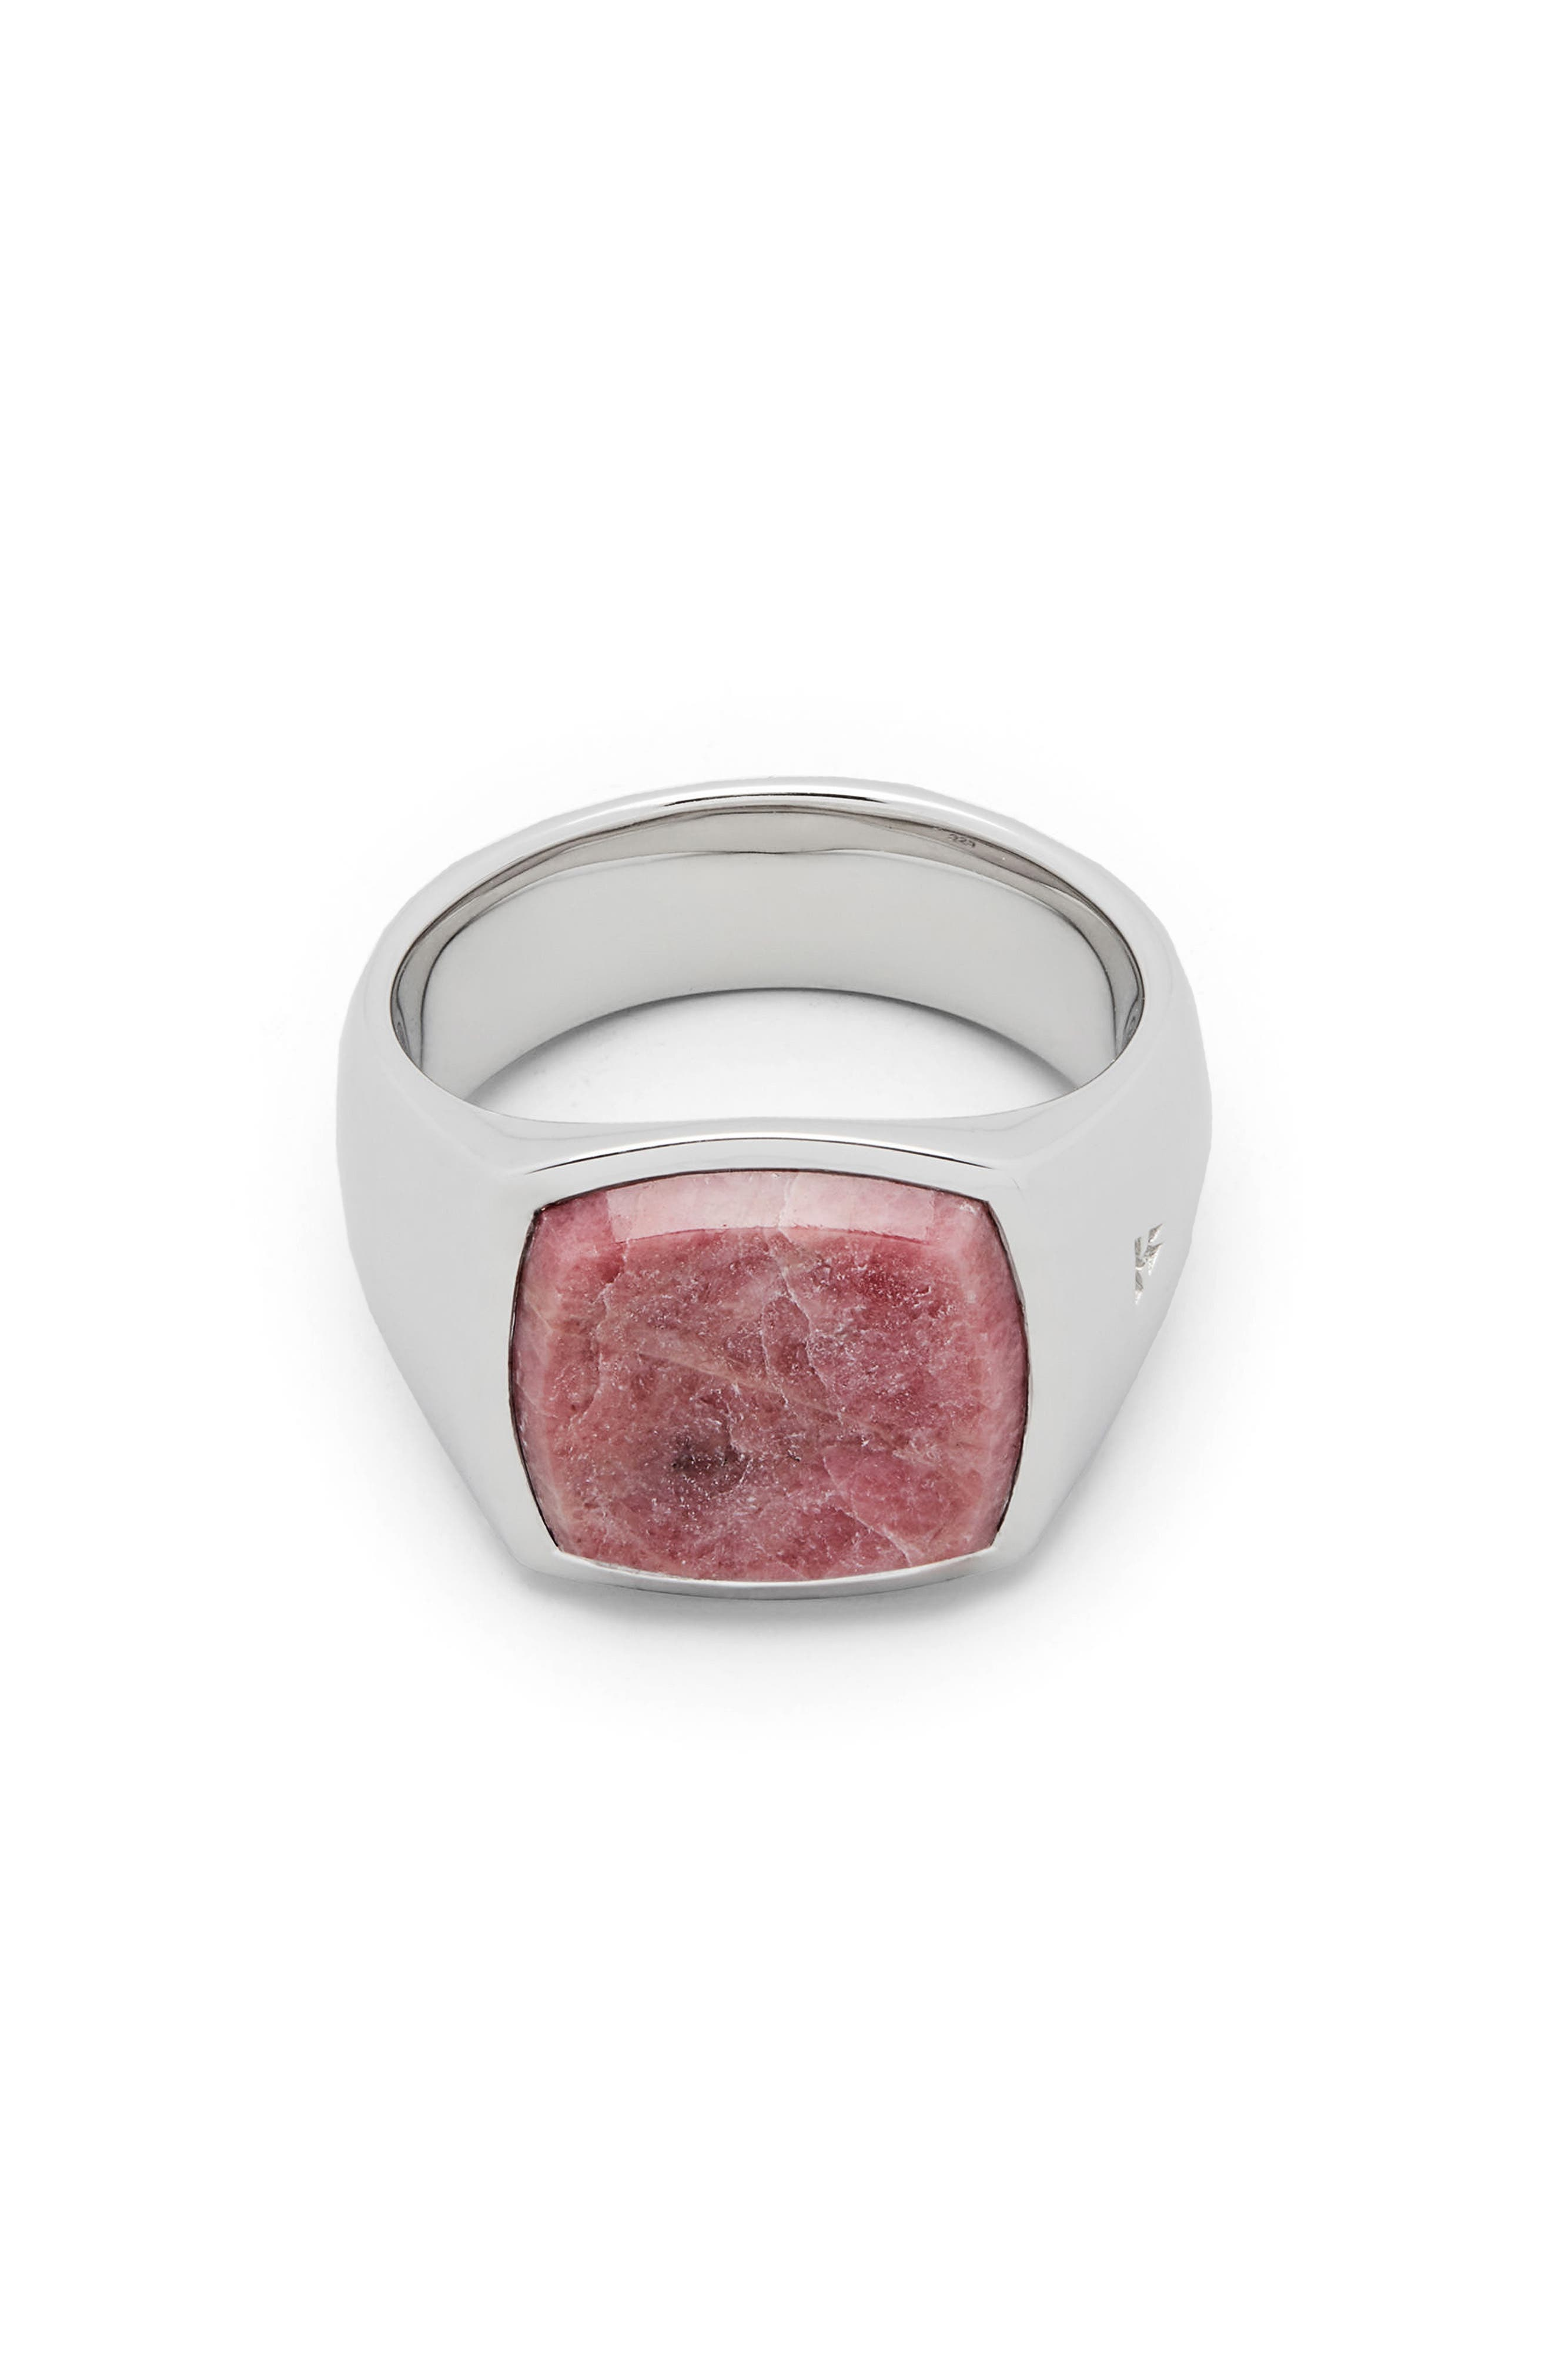 Pink Rhodonite Cushion Signet Ring,                             Main thumbnail 1, color,                             925 STERLING SILVER